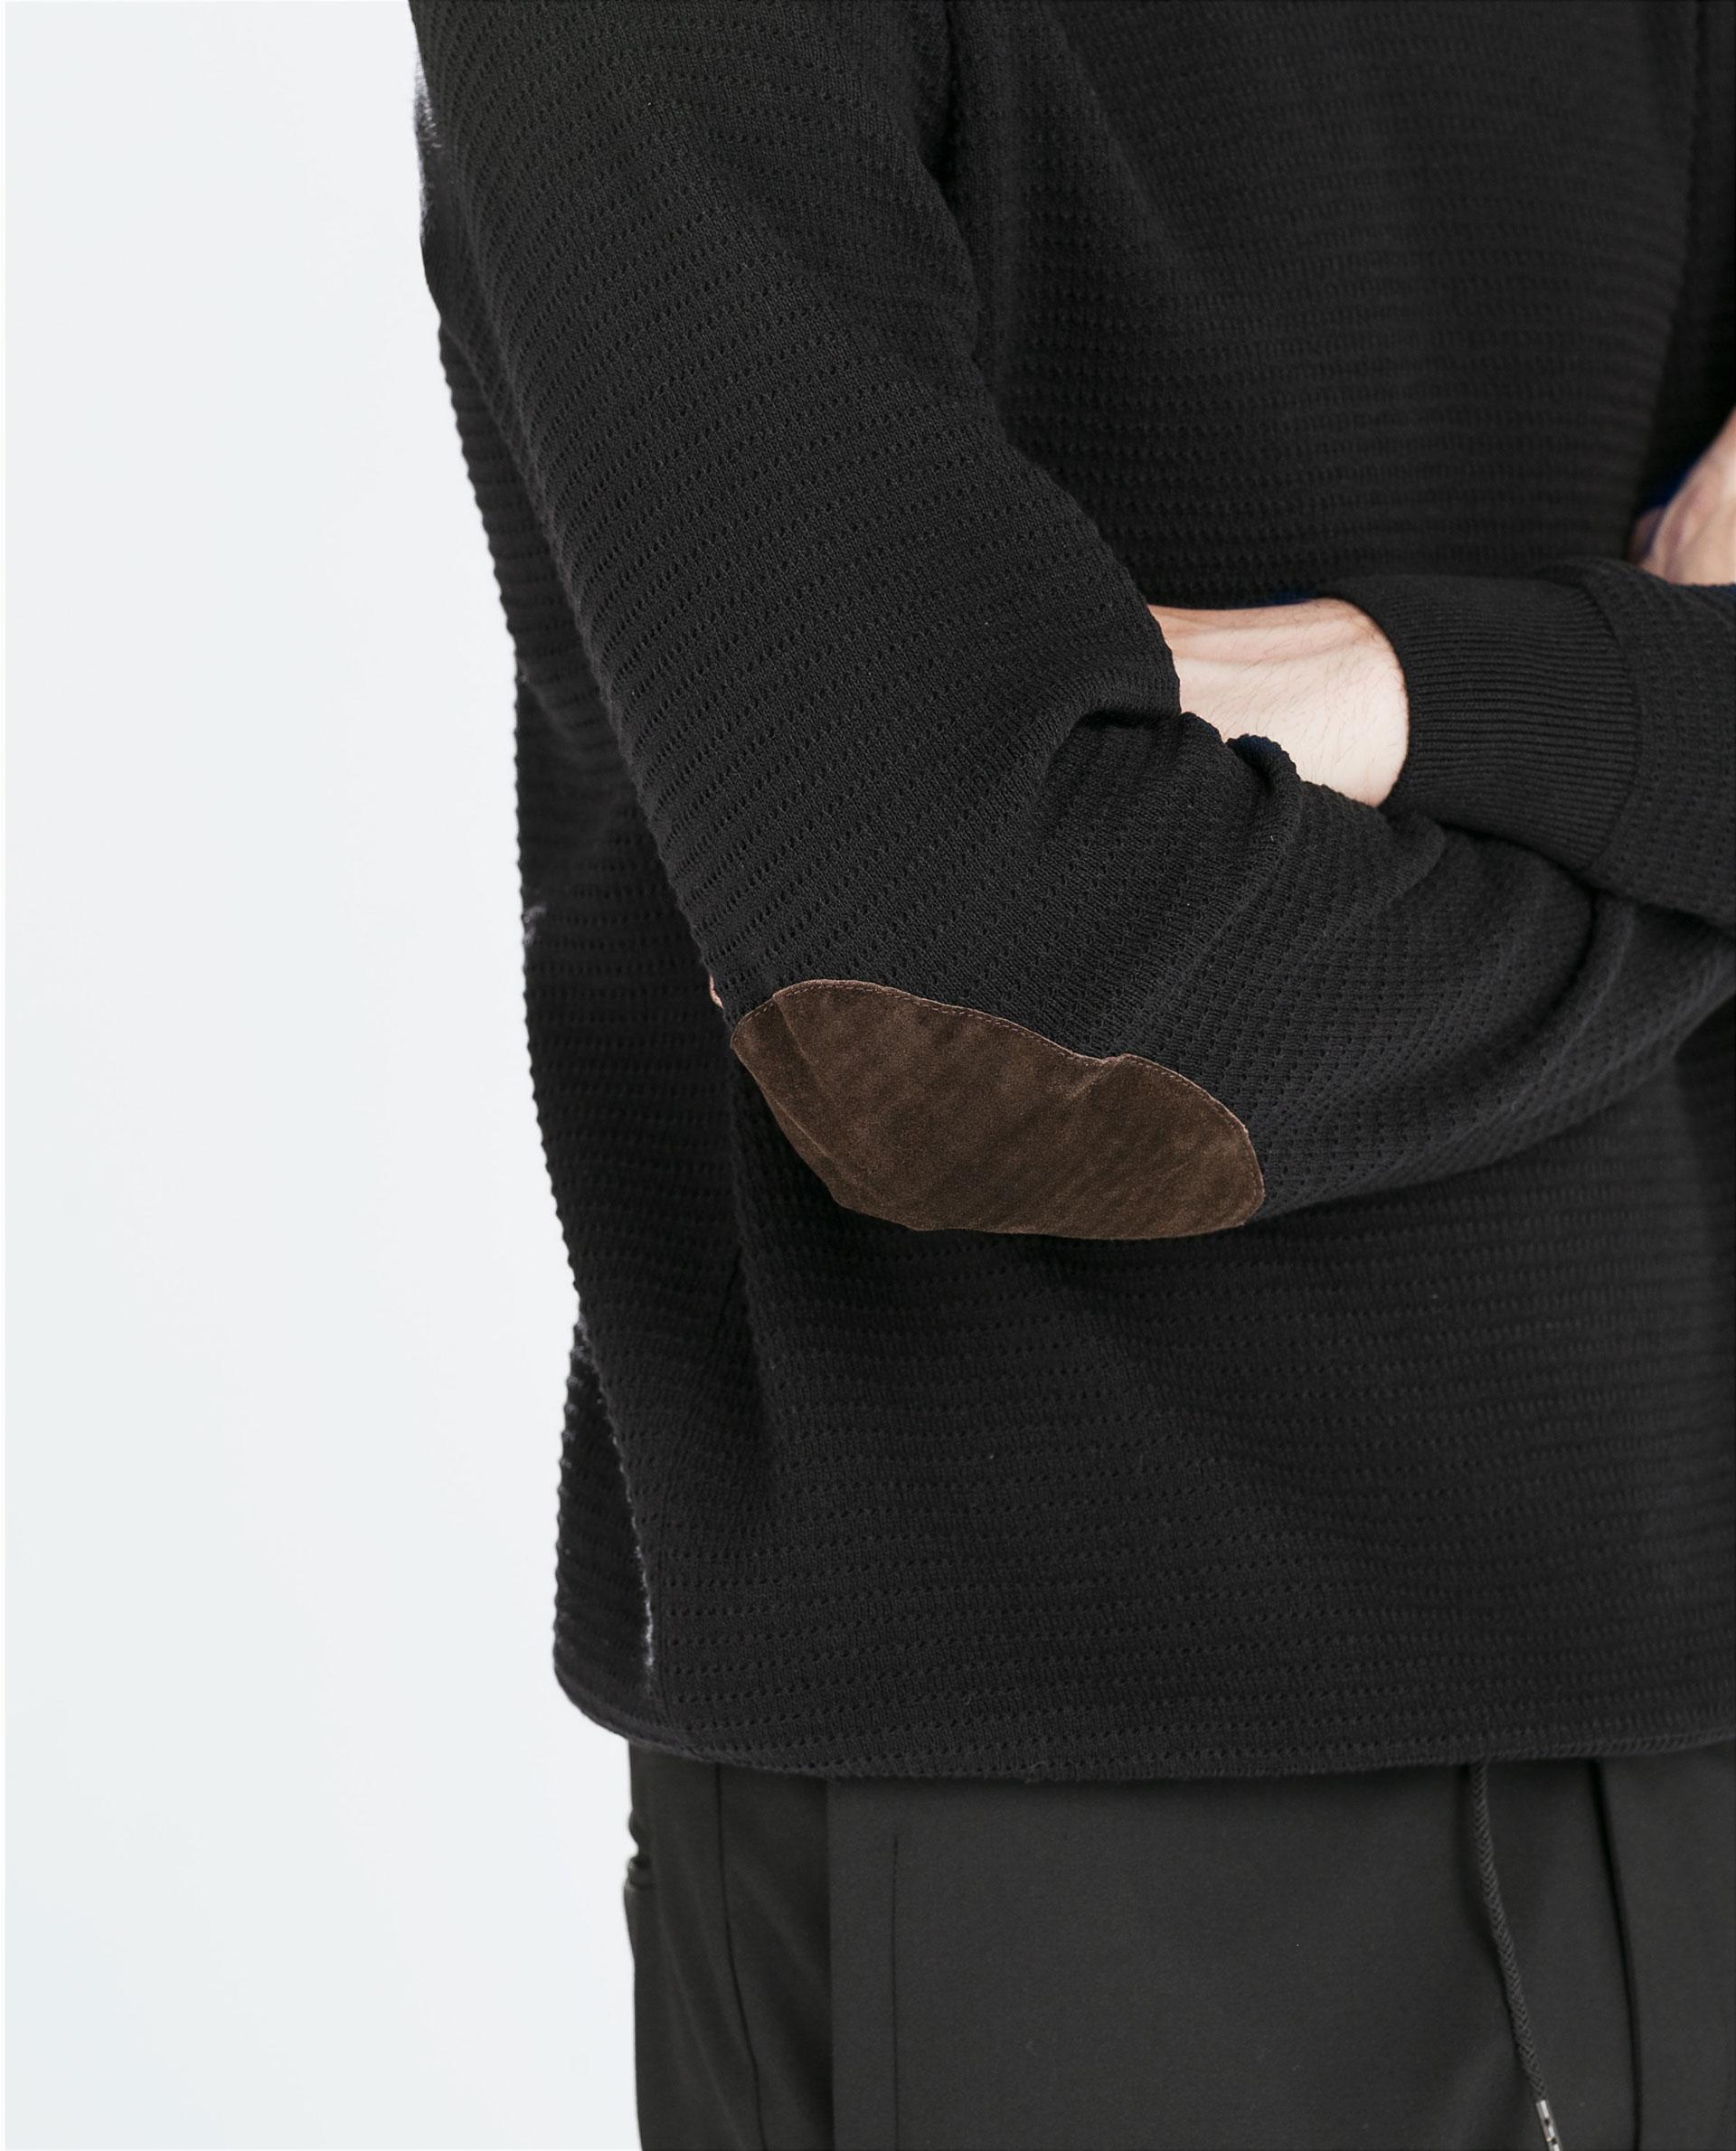 Zara Cardigan Elbow Patches 70